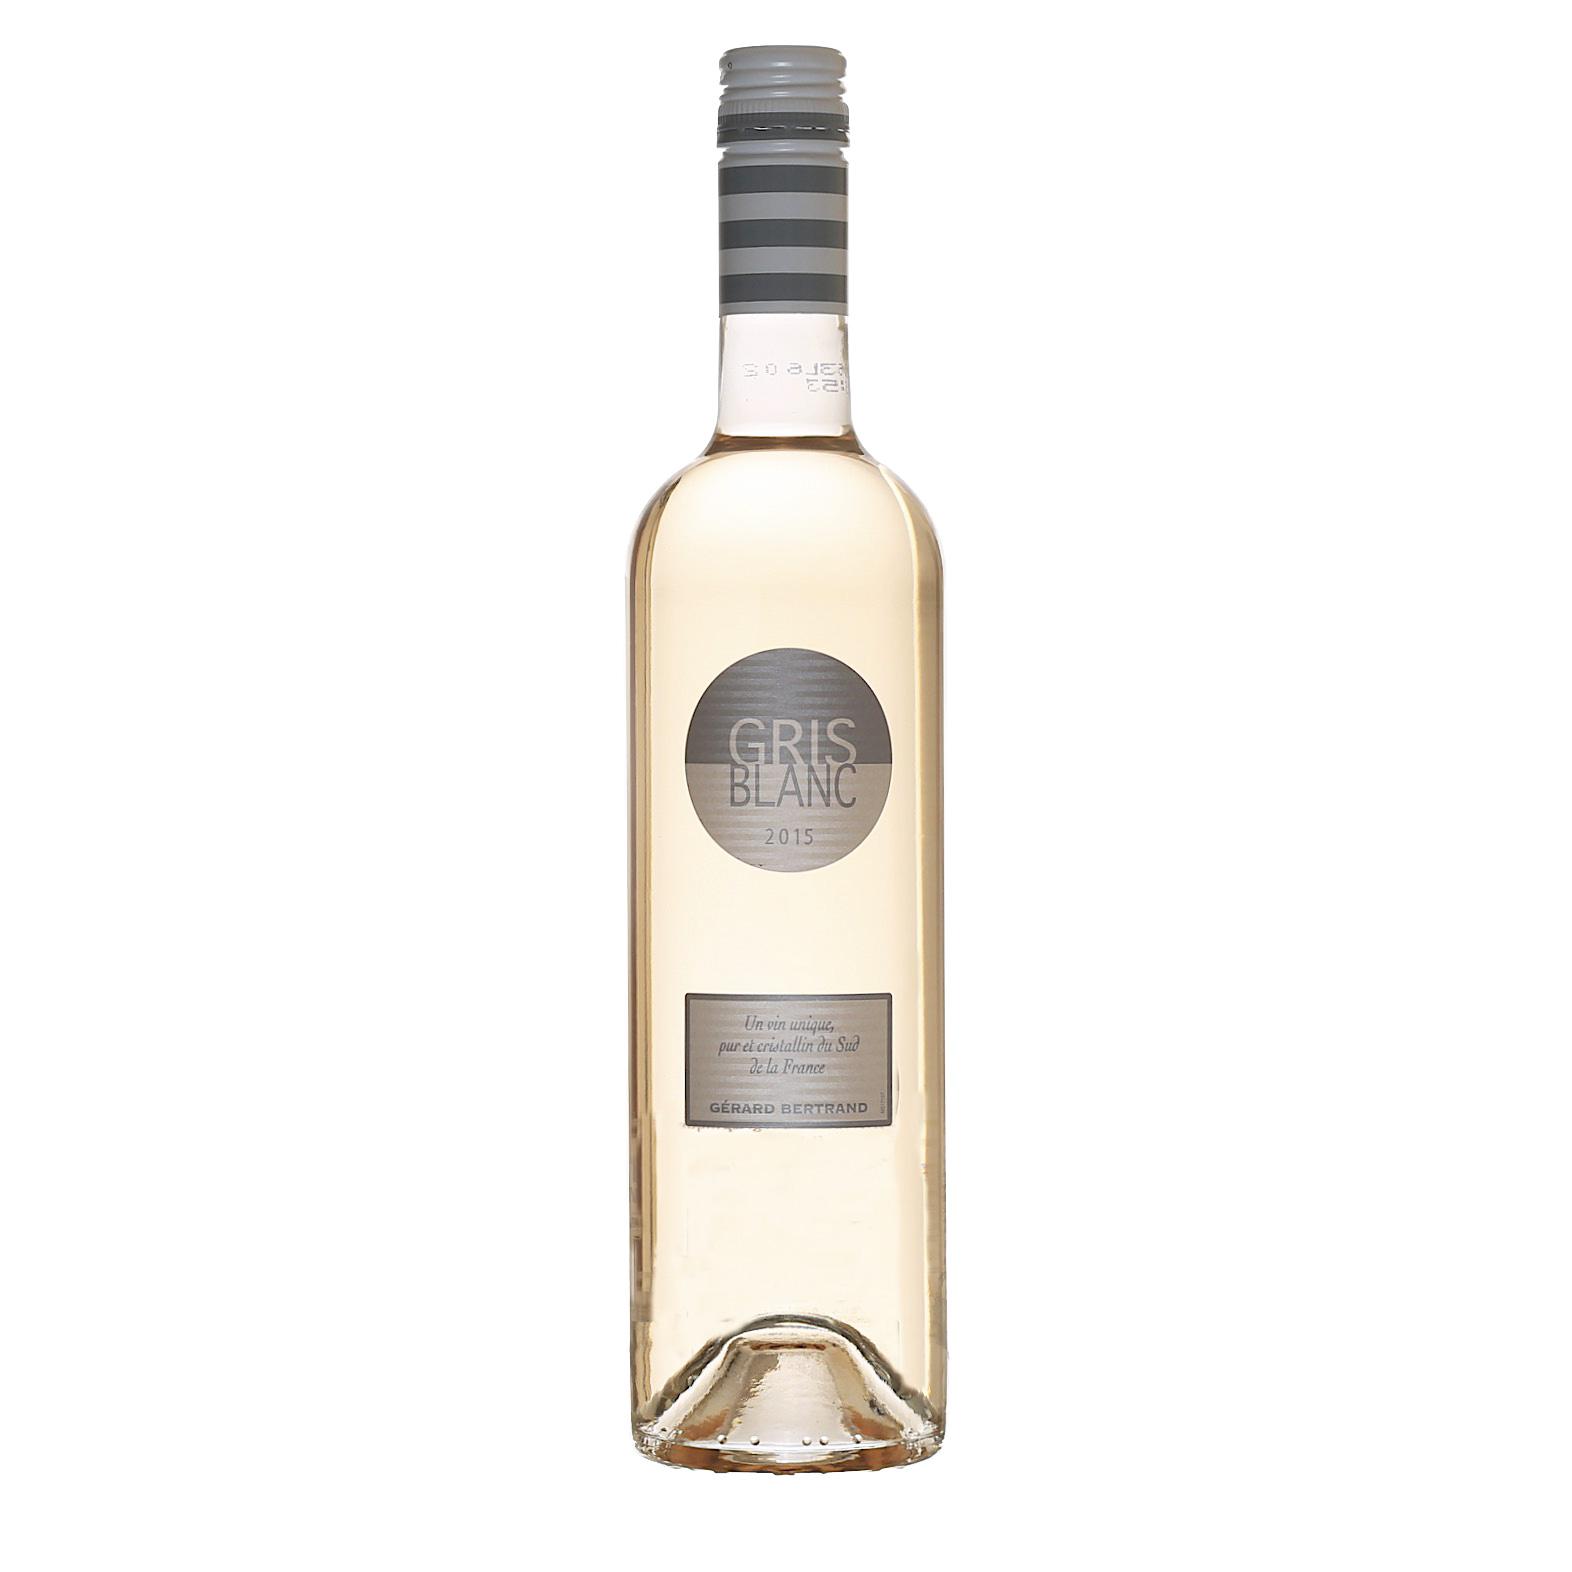 Gerard Bertrand Gris Blanc Quay Wines